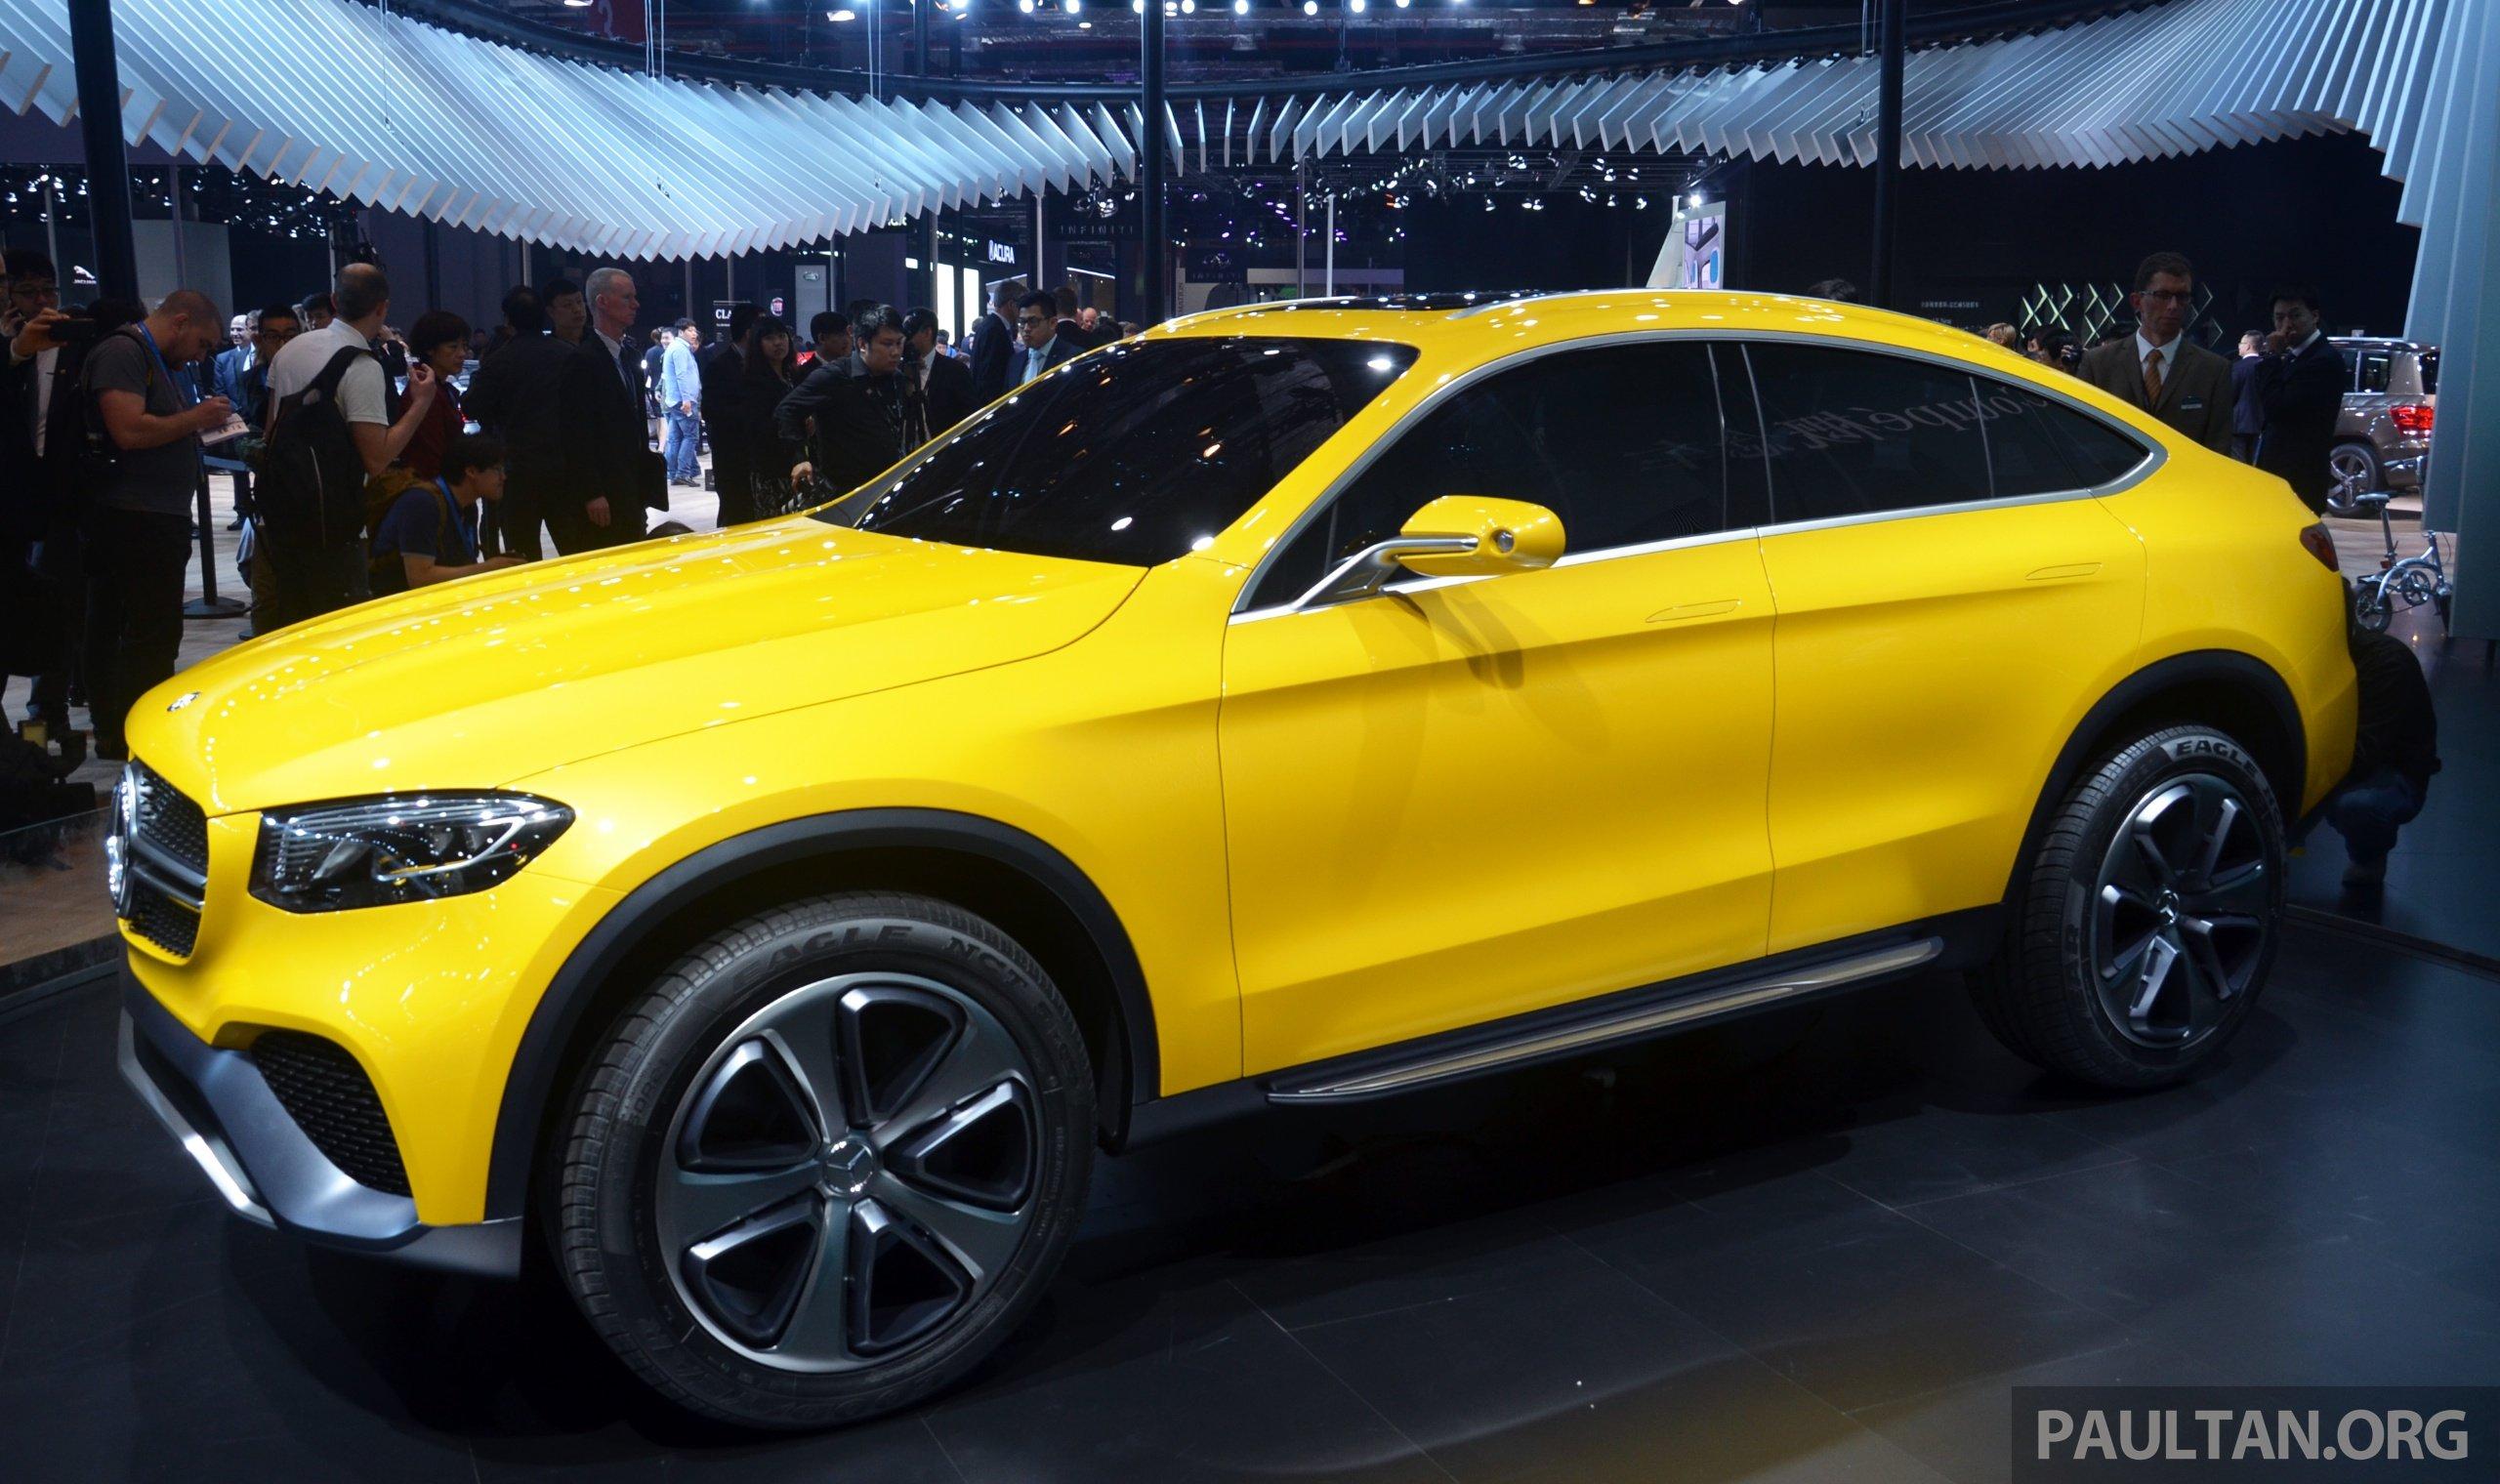 https://s2.paultan.org/image/2015/04/mercedes-benz-glc-coupe-concept-shanghai-1211.jpg